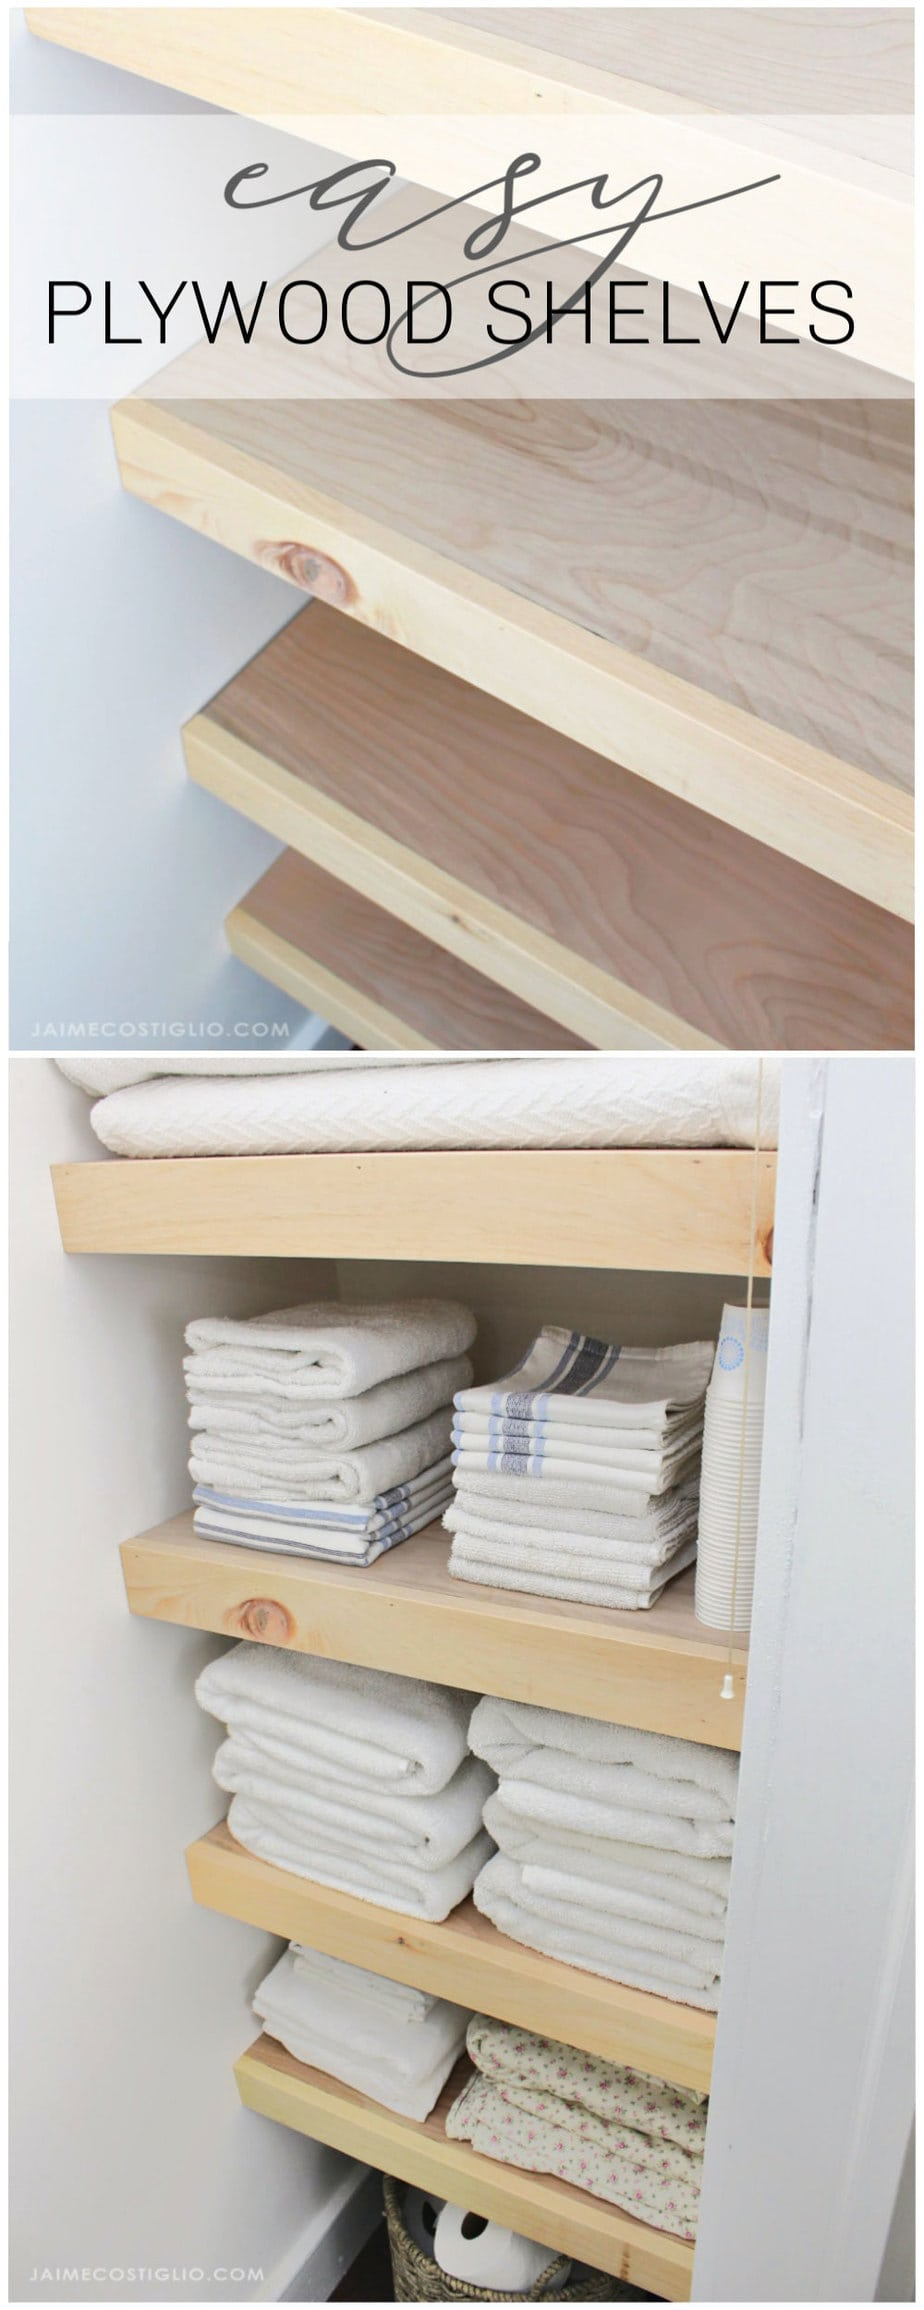 easy plywood shelves